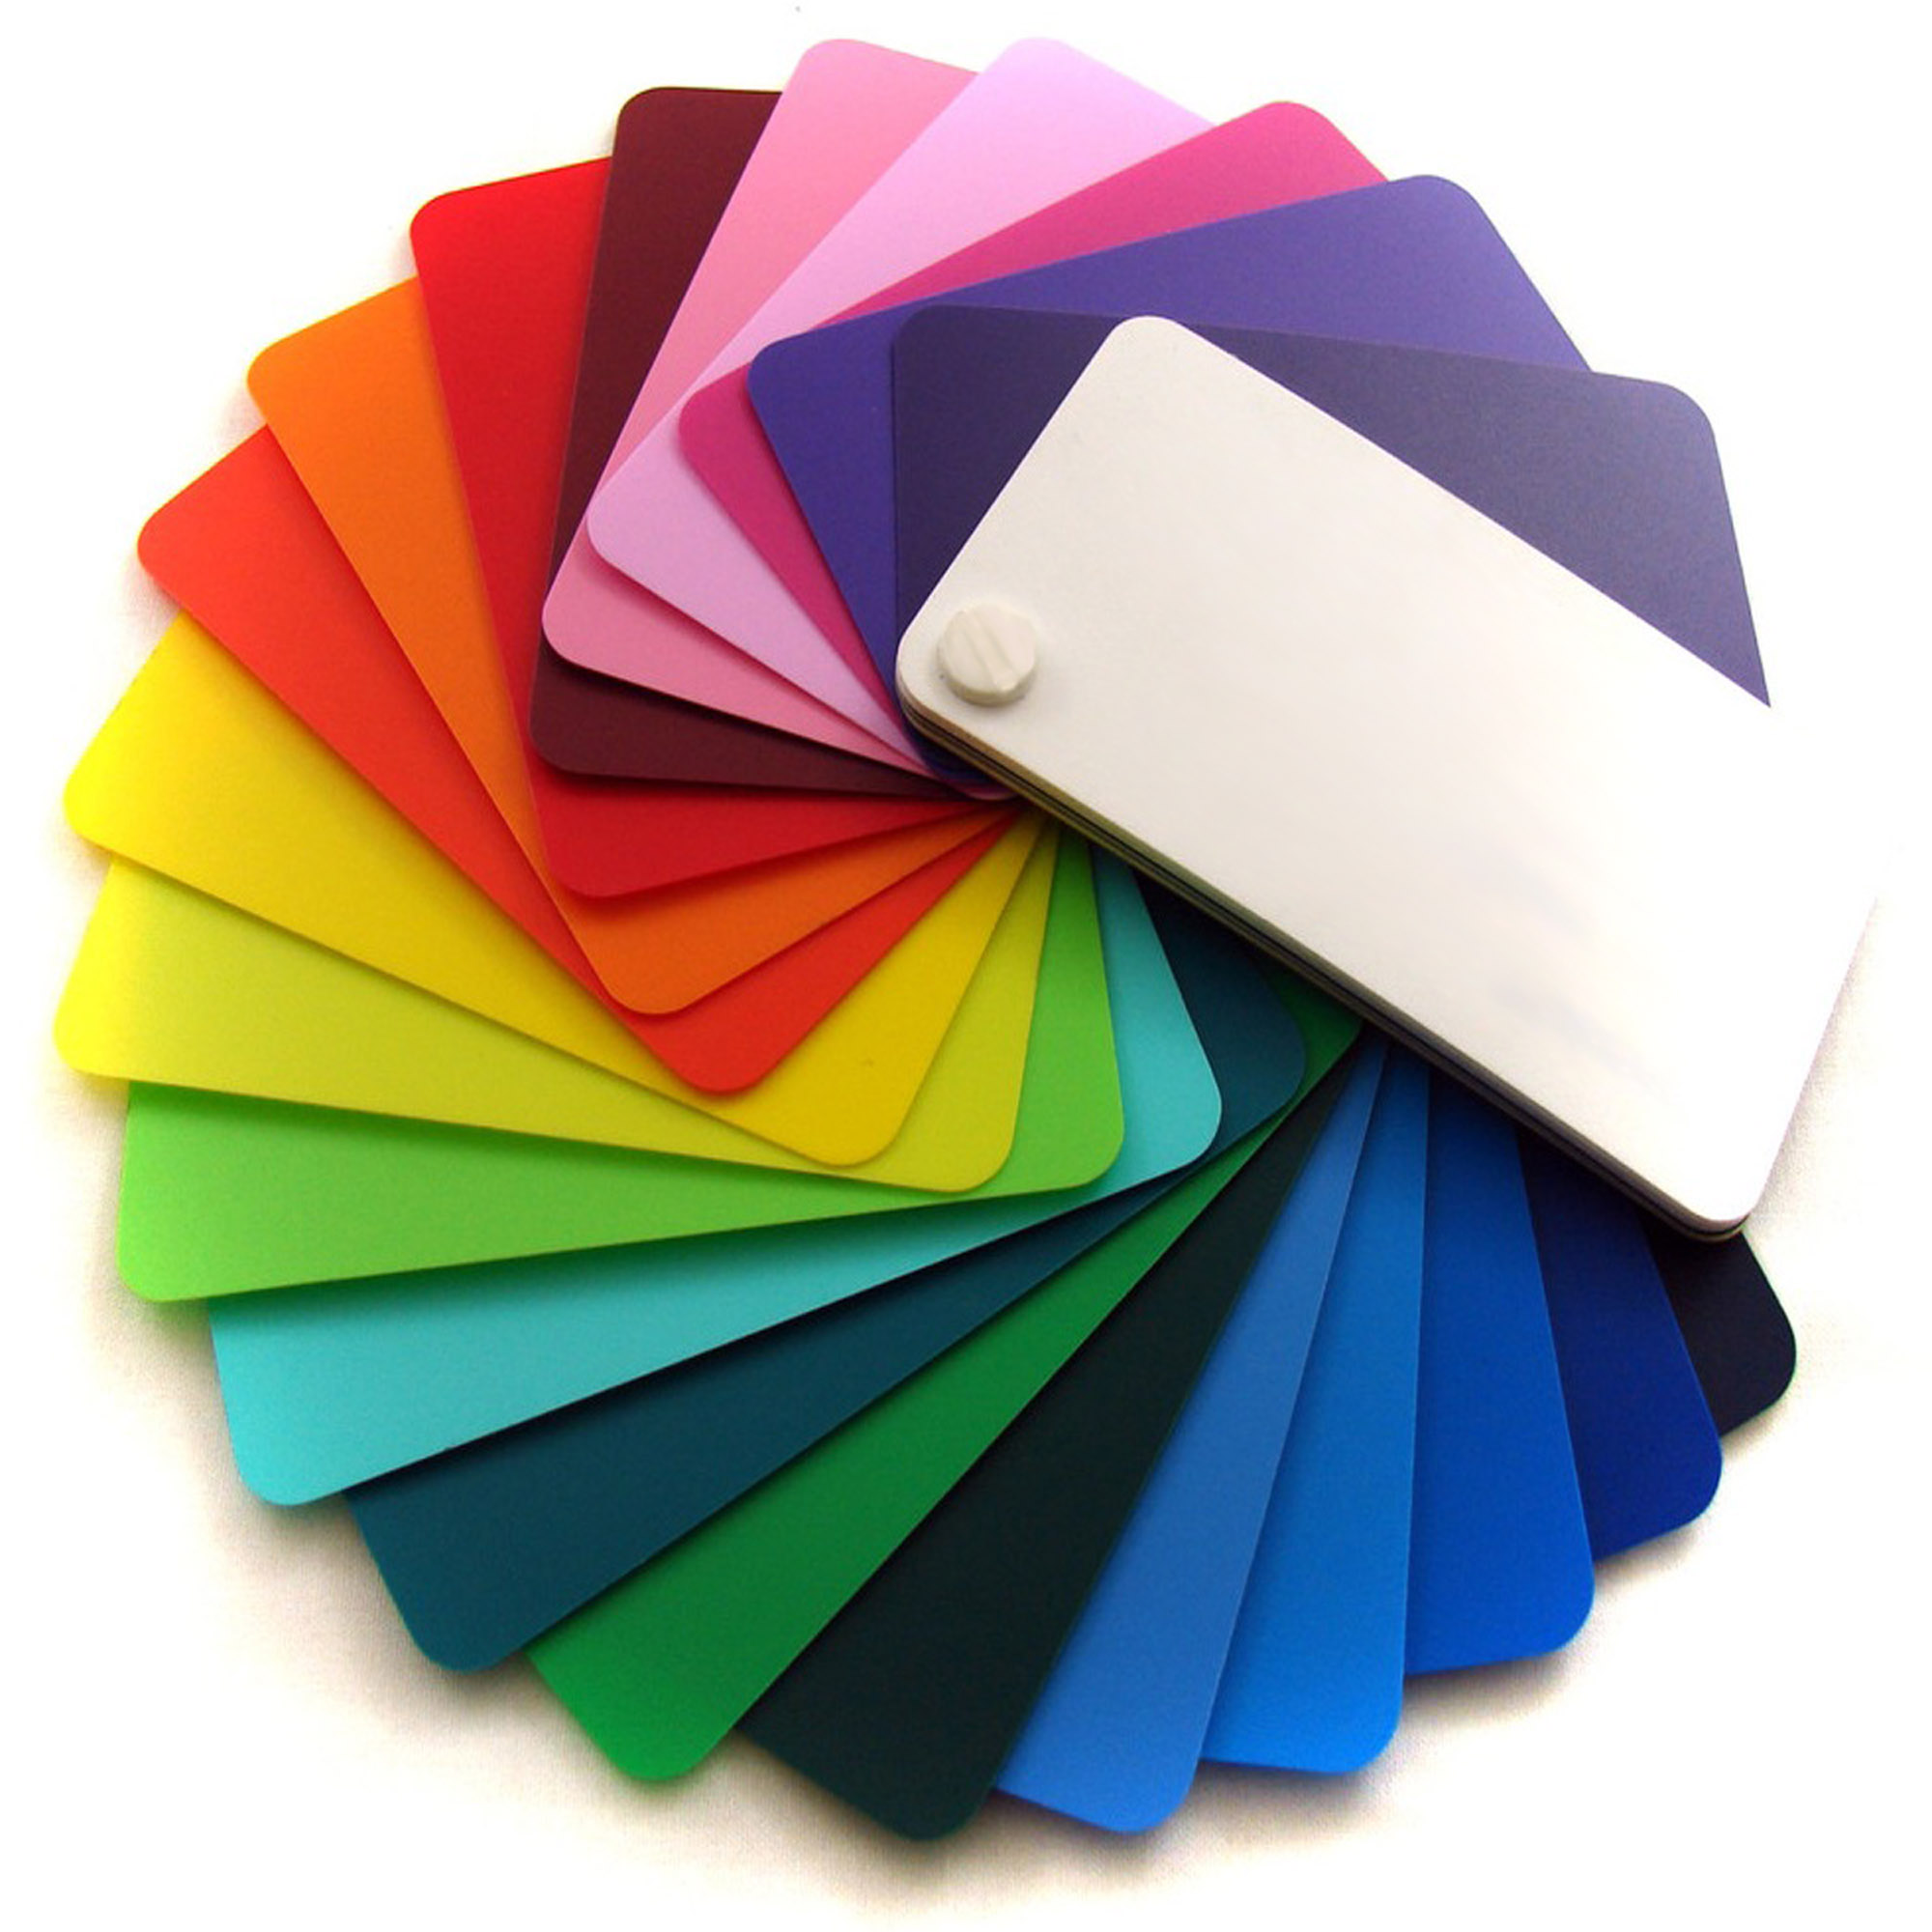 cartadecolores.jpg